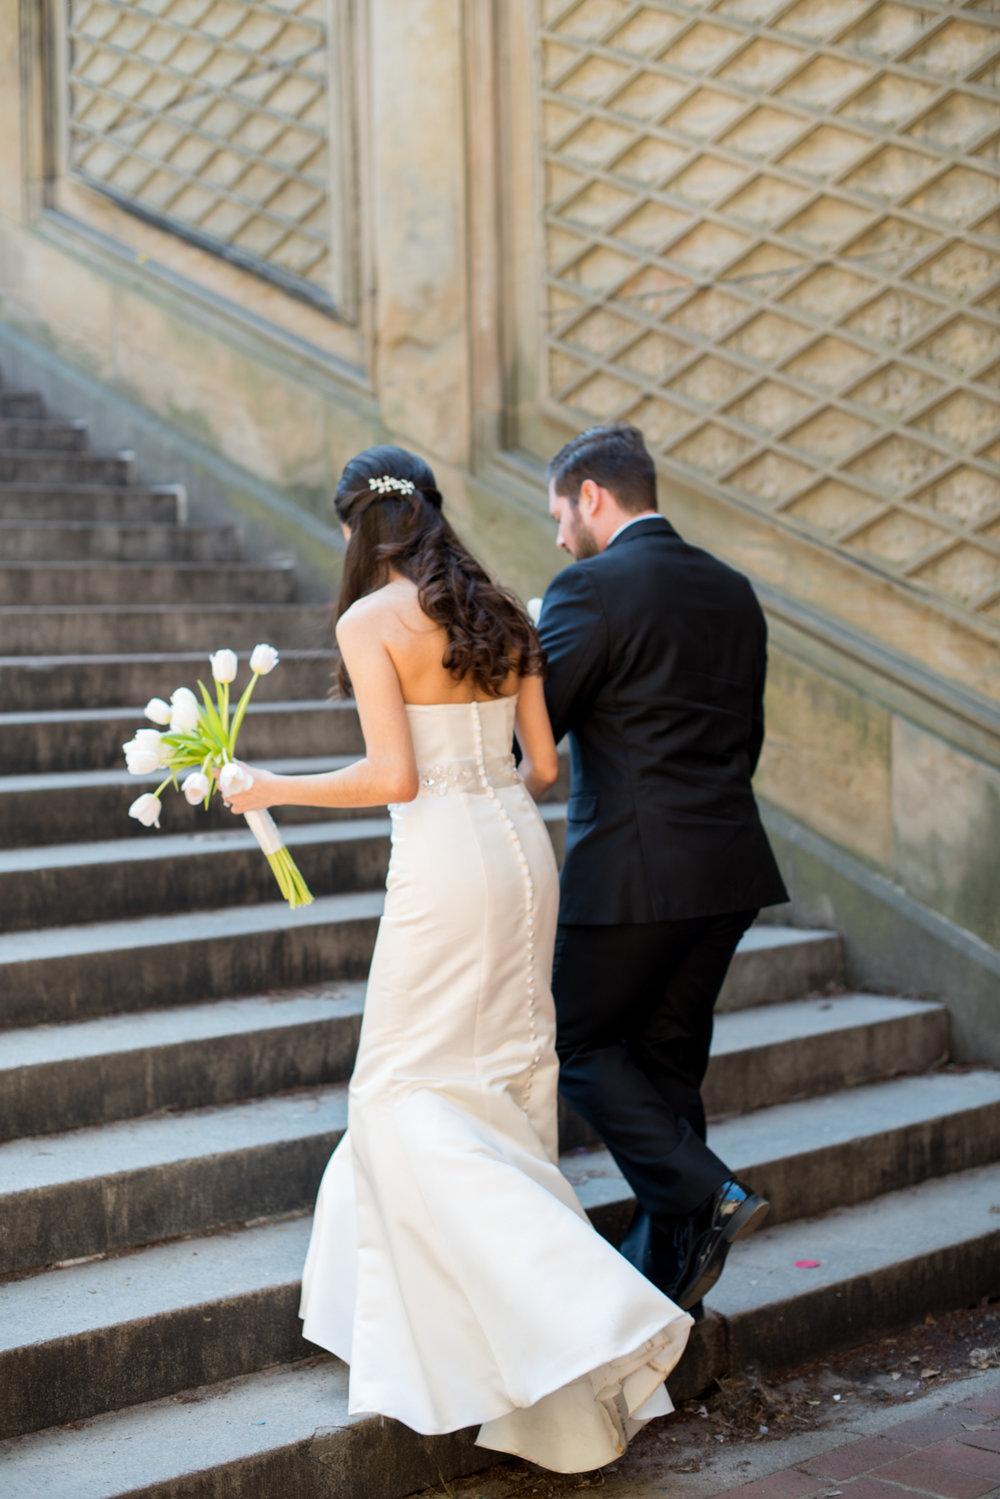 Central Park Elopement- New York City Weddings- DIY Weddings- New York- Olivia Christina Photography